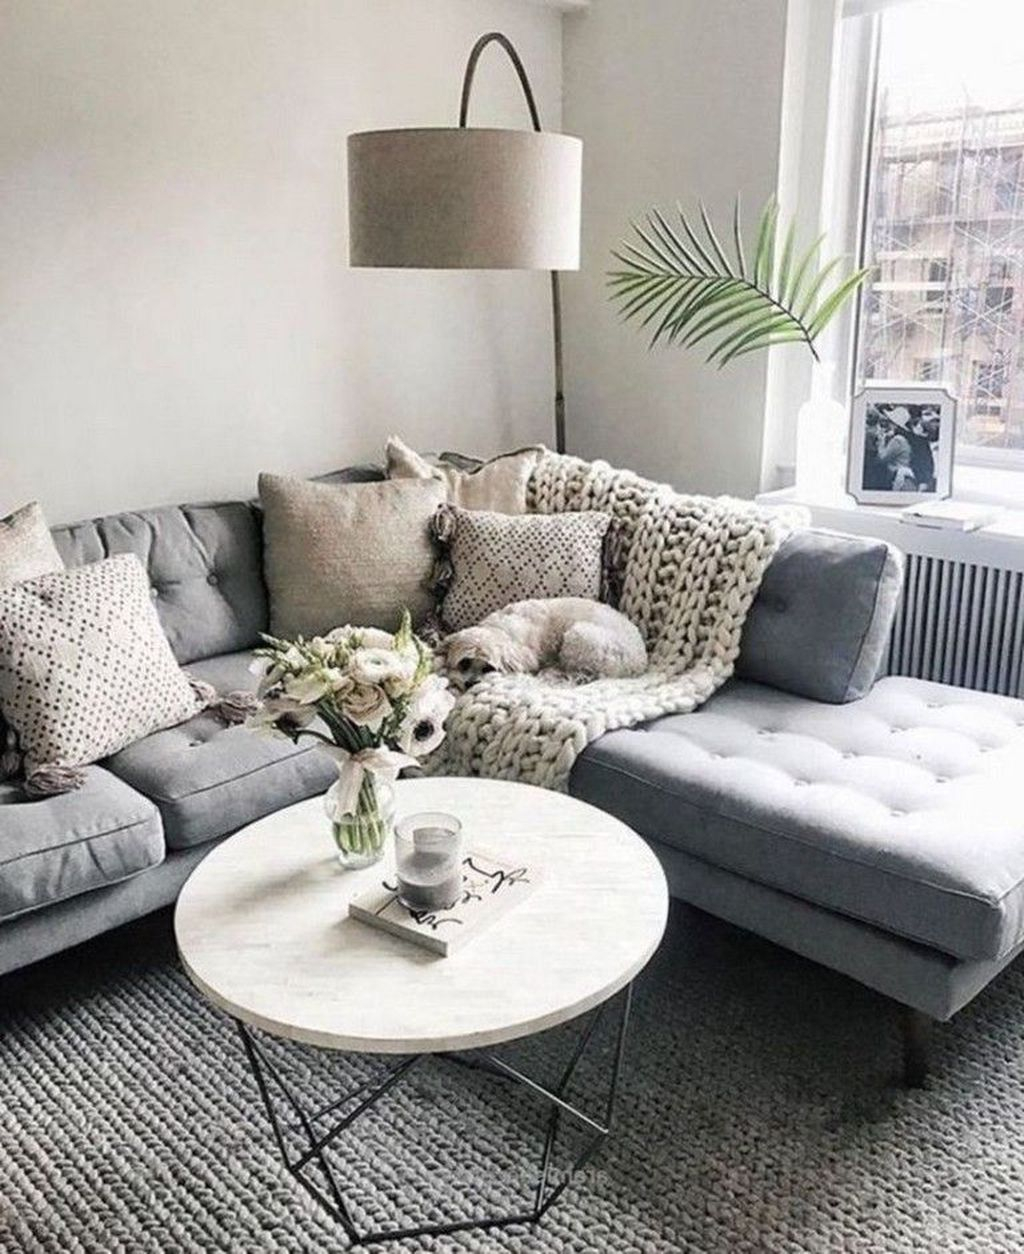 Excellent Furniture Design Ideas For Your Living Room 39